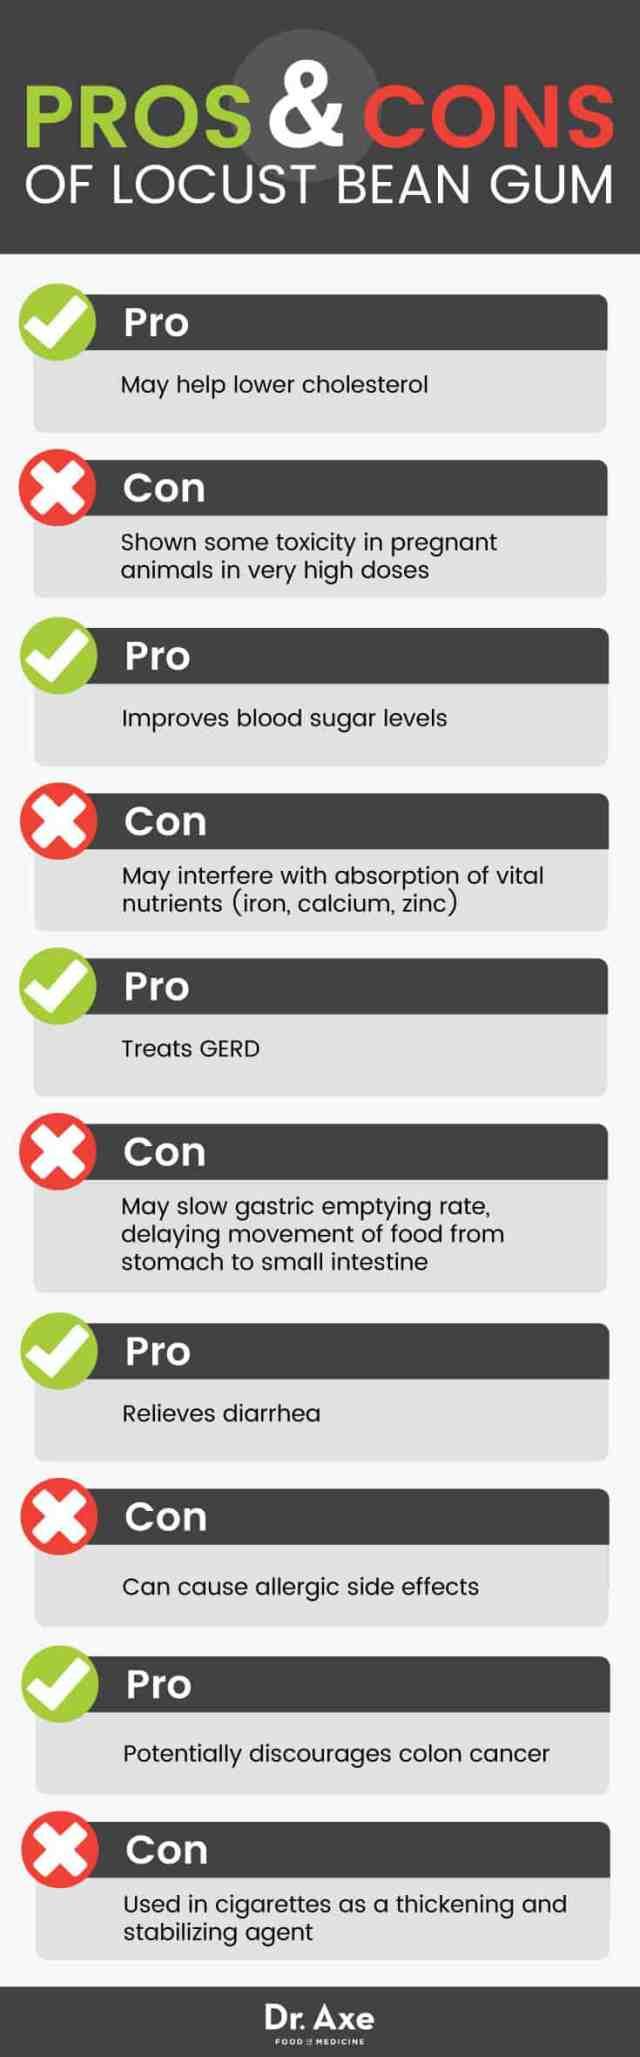 Pros and cons of locust bean gum - Dr. Axe